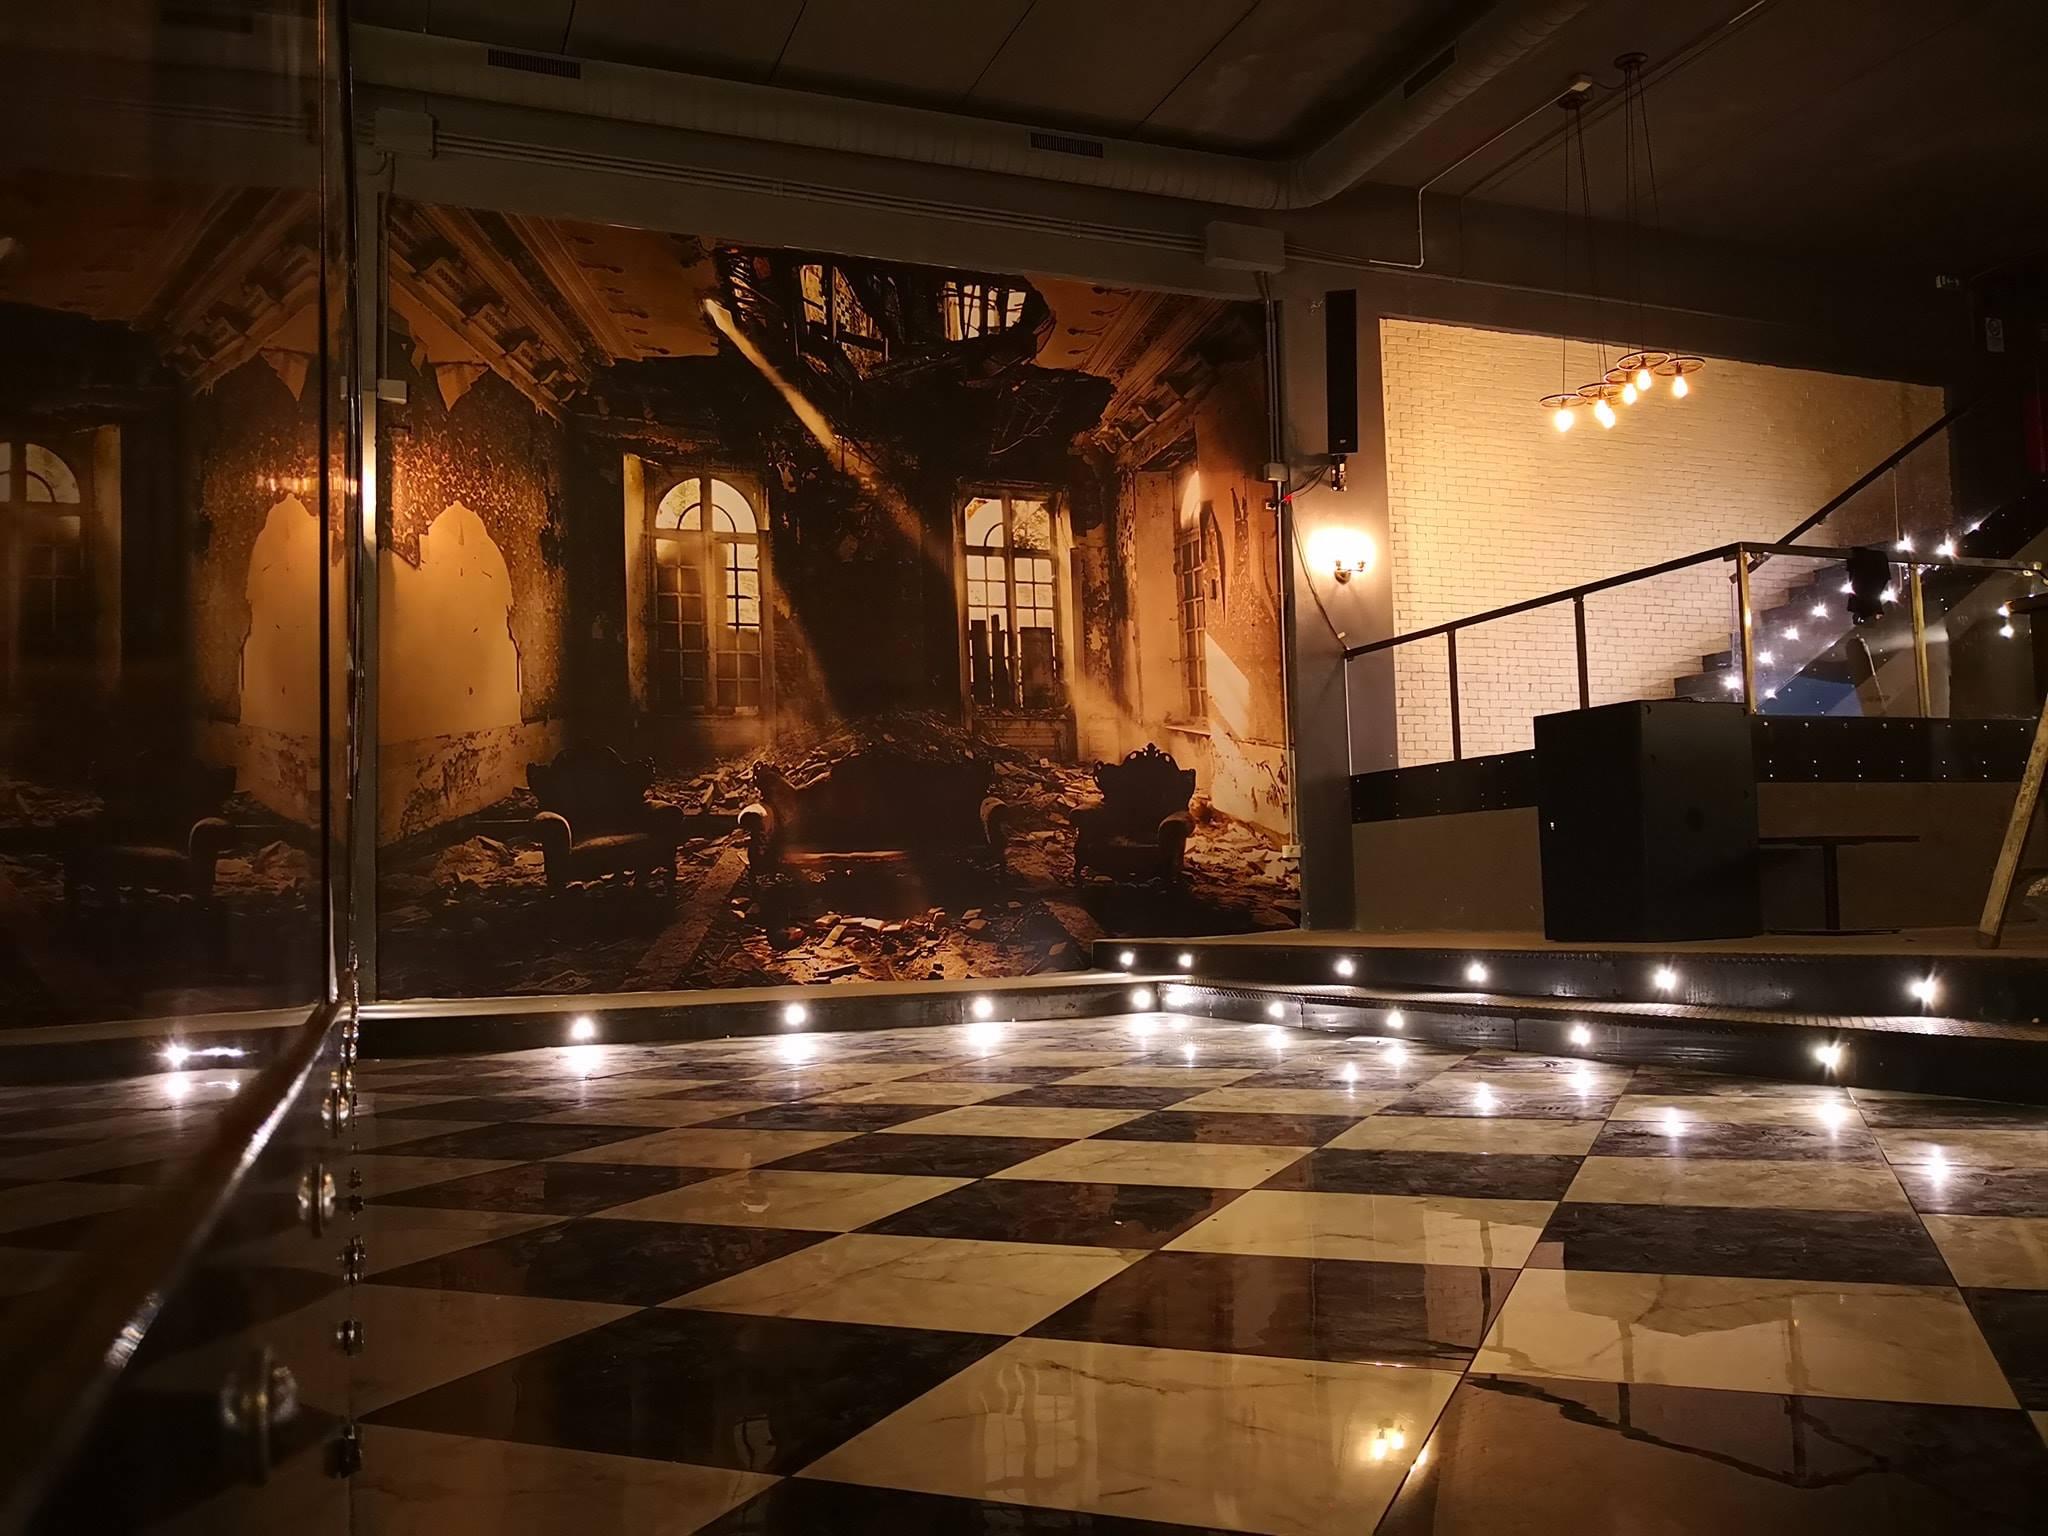 room-wall-paper-pellicola-murale-pellicola-per-muri-discoteca-diroccata-club